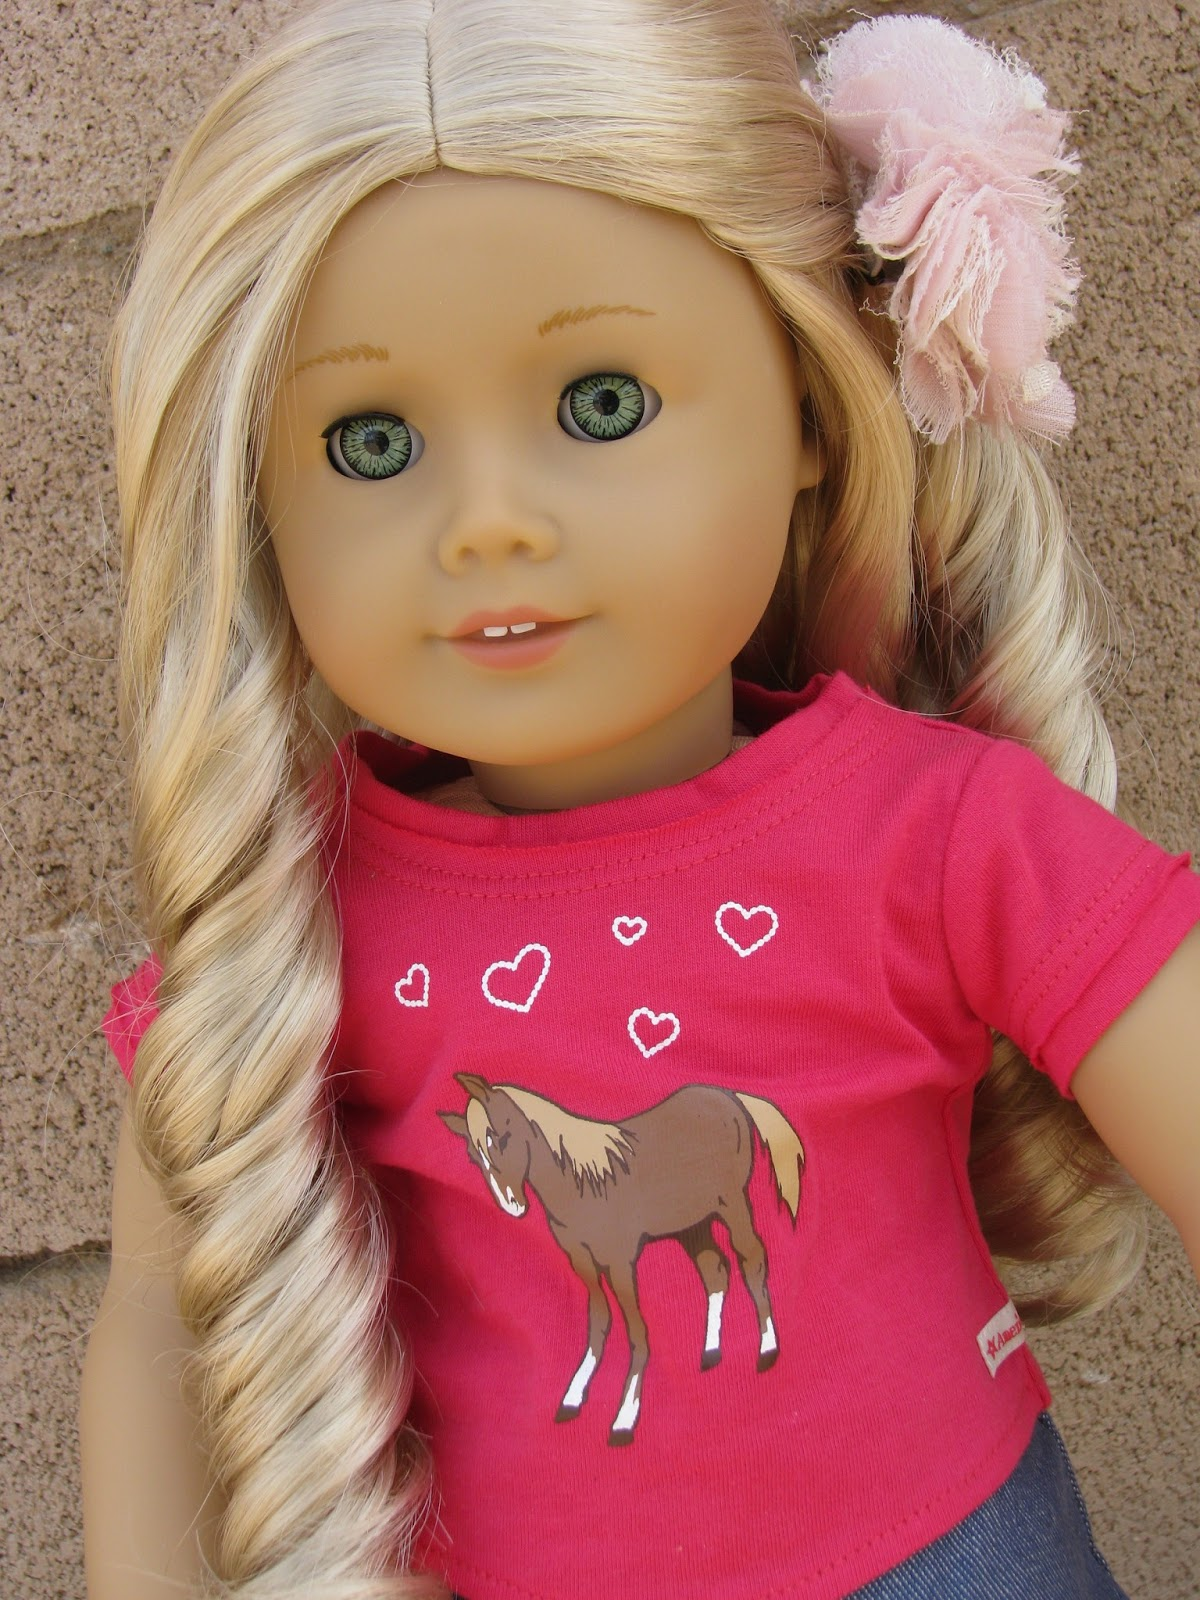 Caroline S 37 Piece Capsule Wardrobe Creative Process: AMERICANGIRL#1FANS: // Caroline's Country Girl Photoshoot